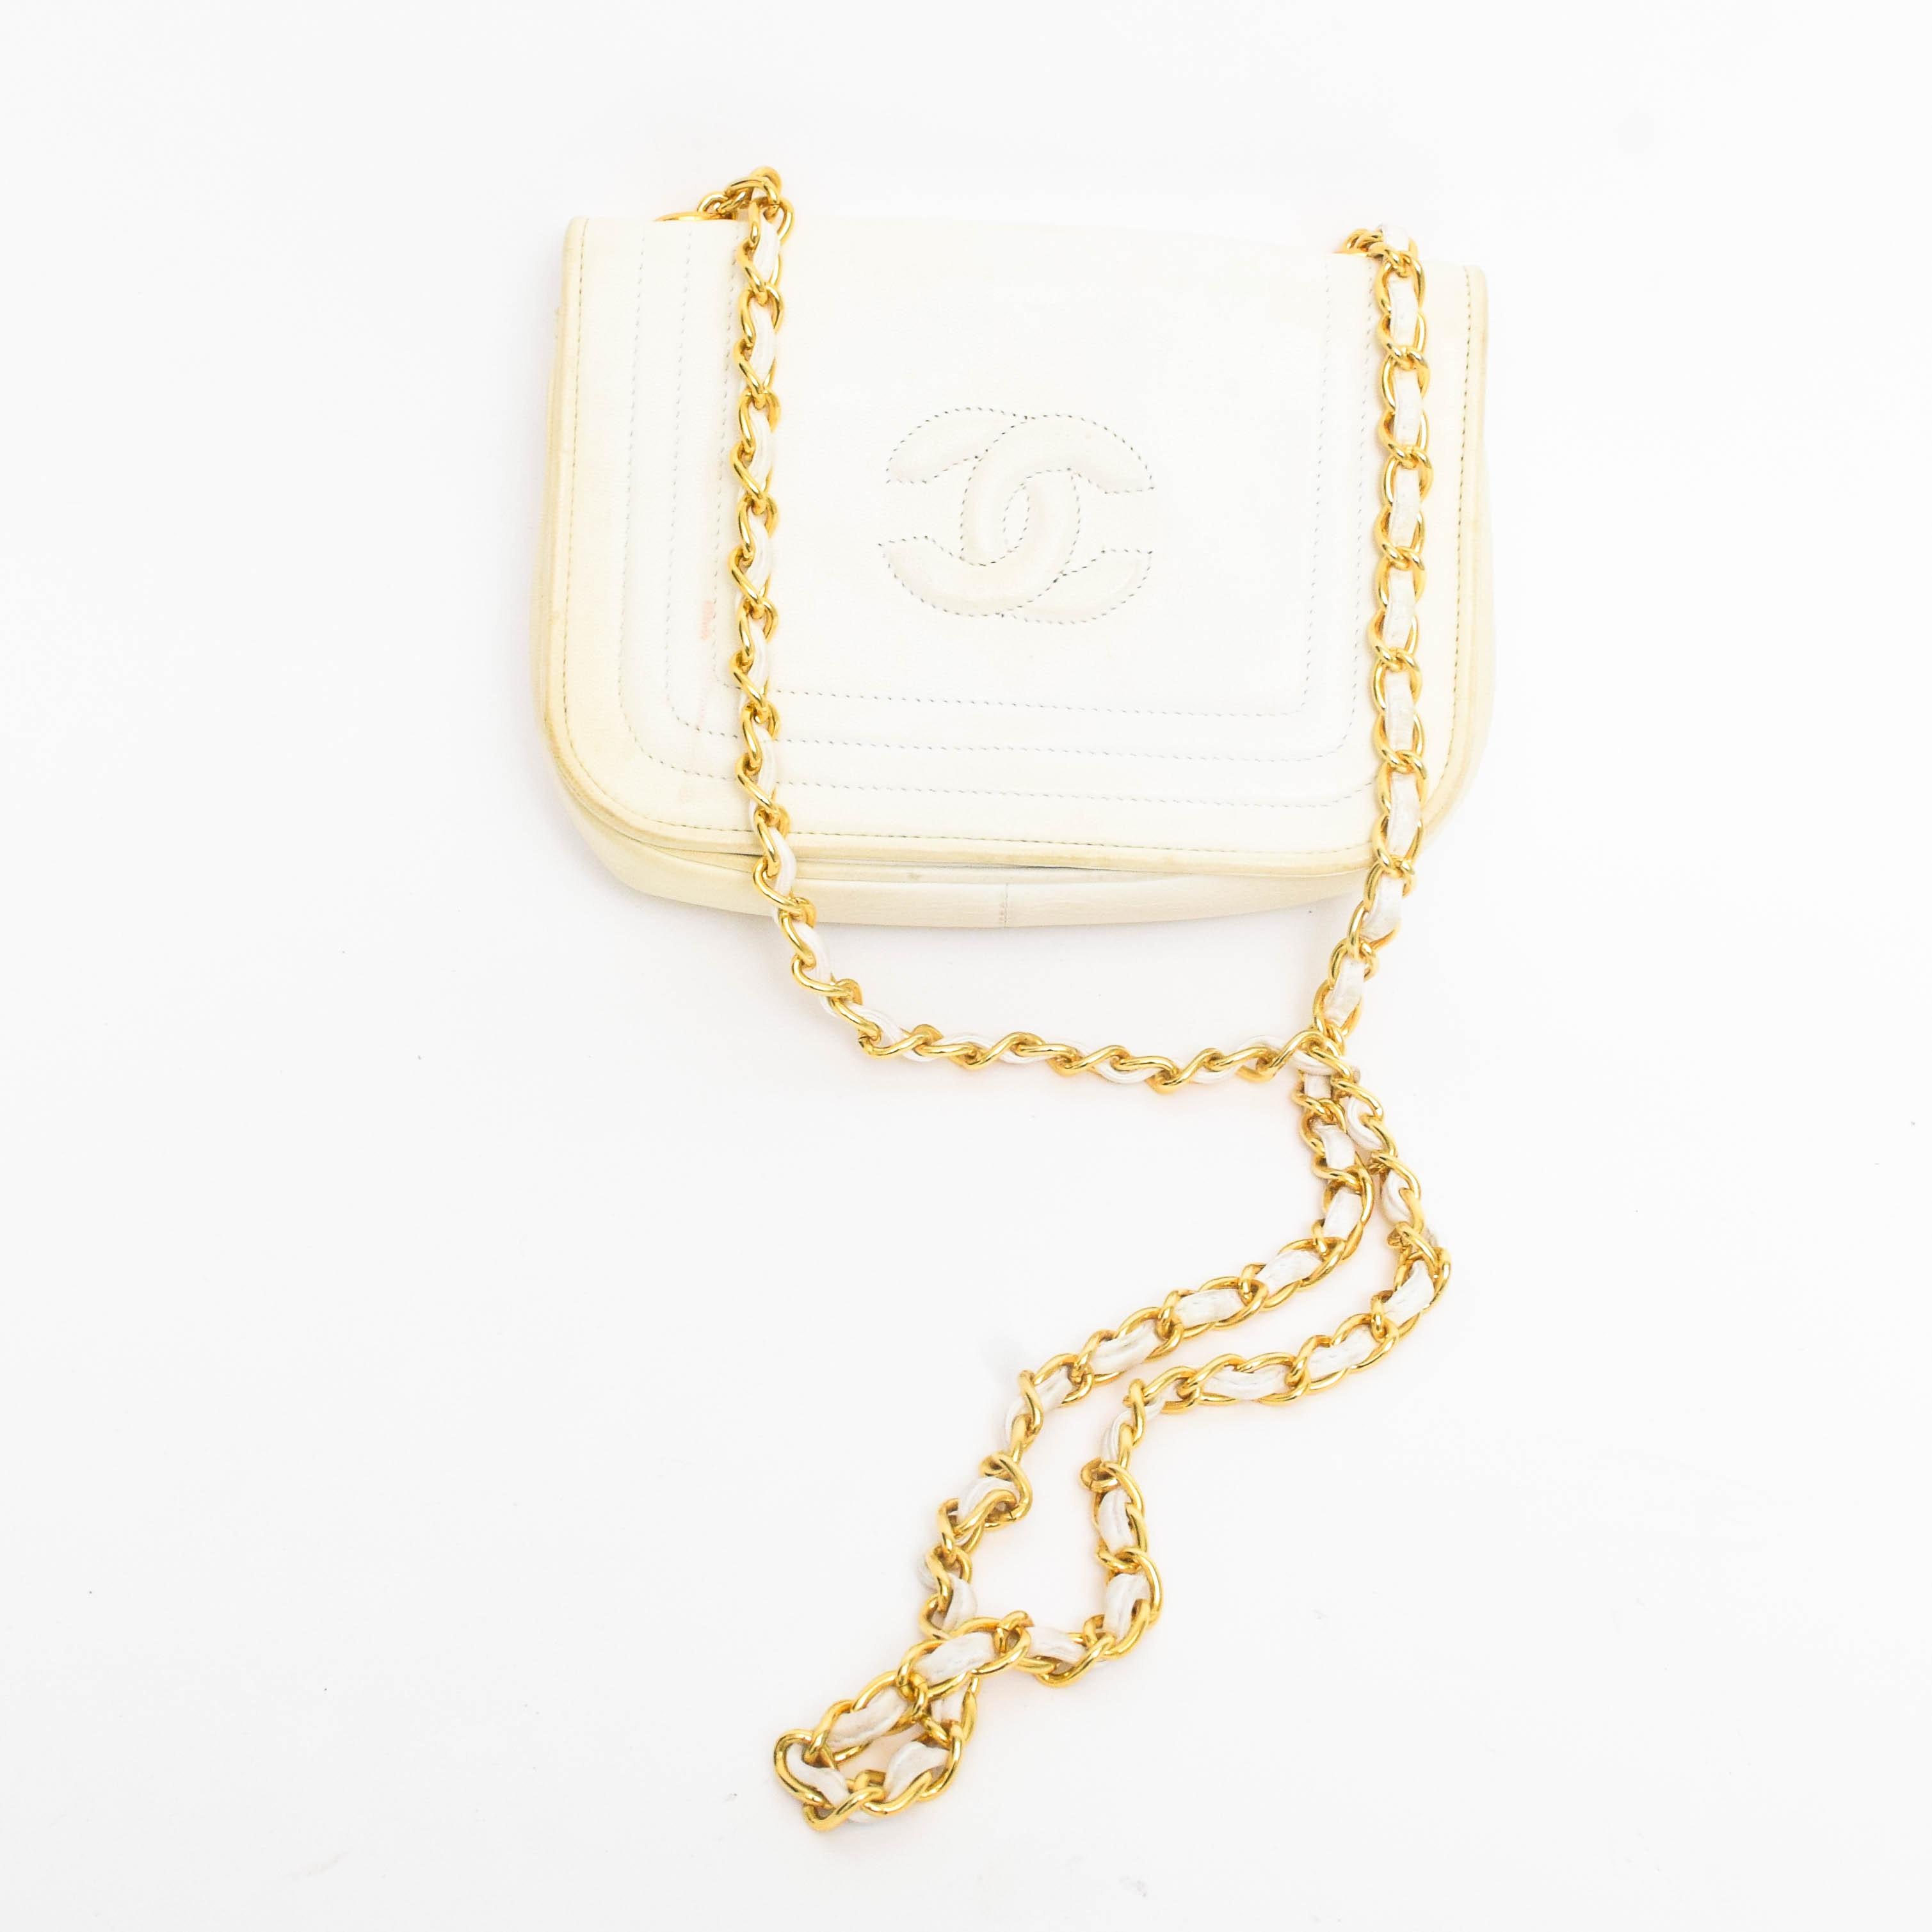 Circa 1980s Chanel Flap Bag